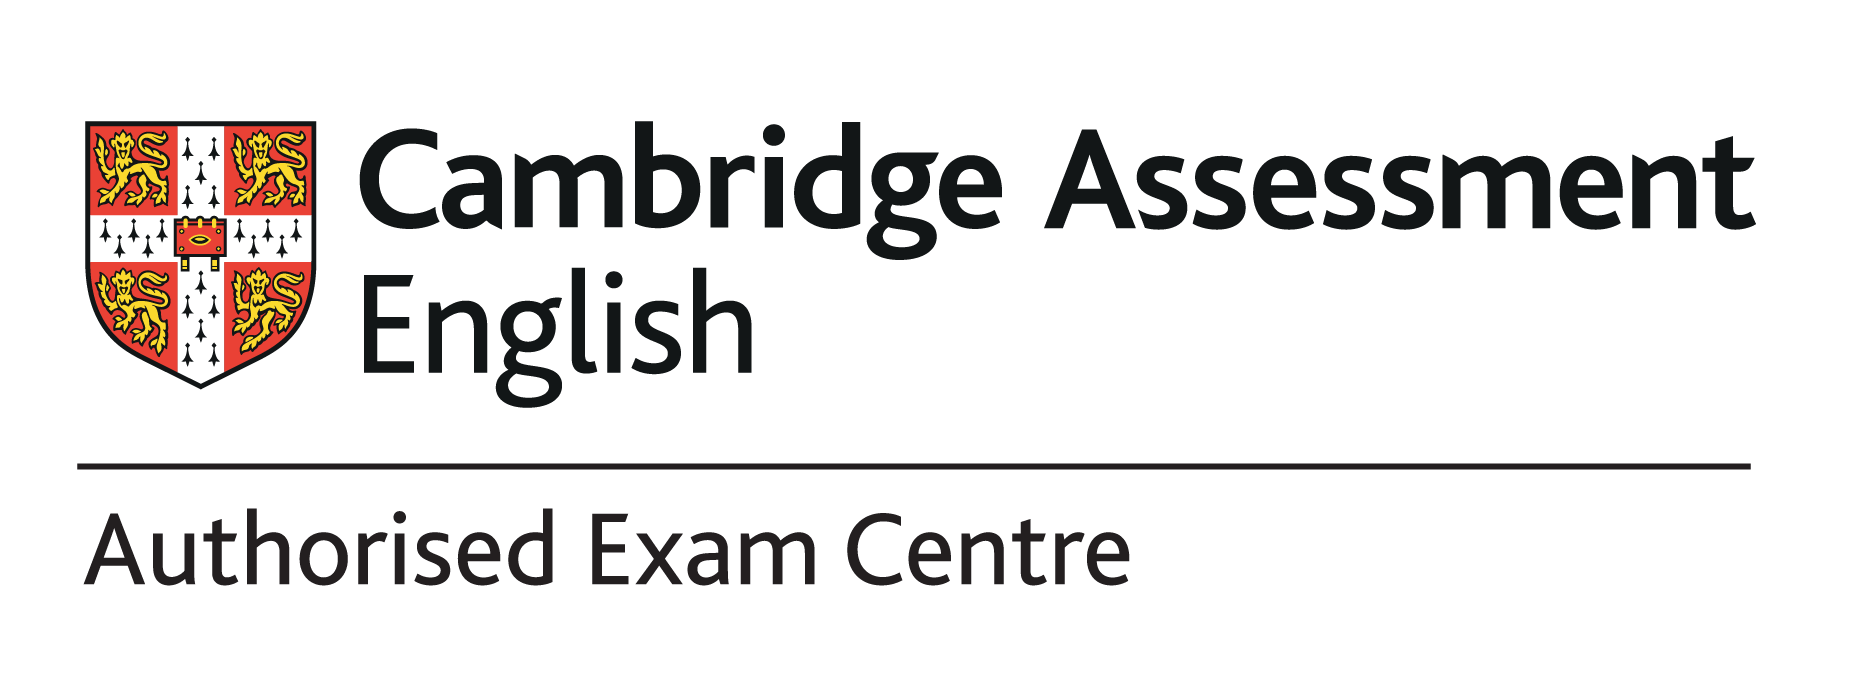 examens Cambridge VICTORIA'S English